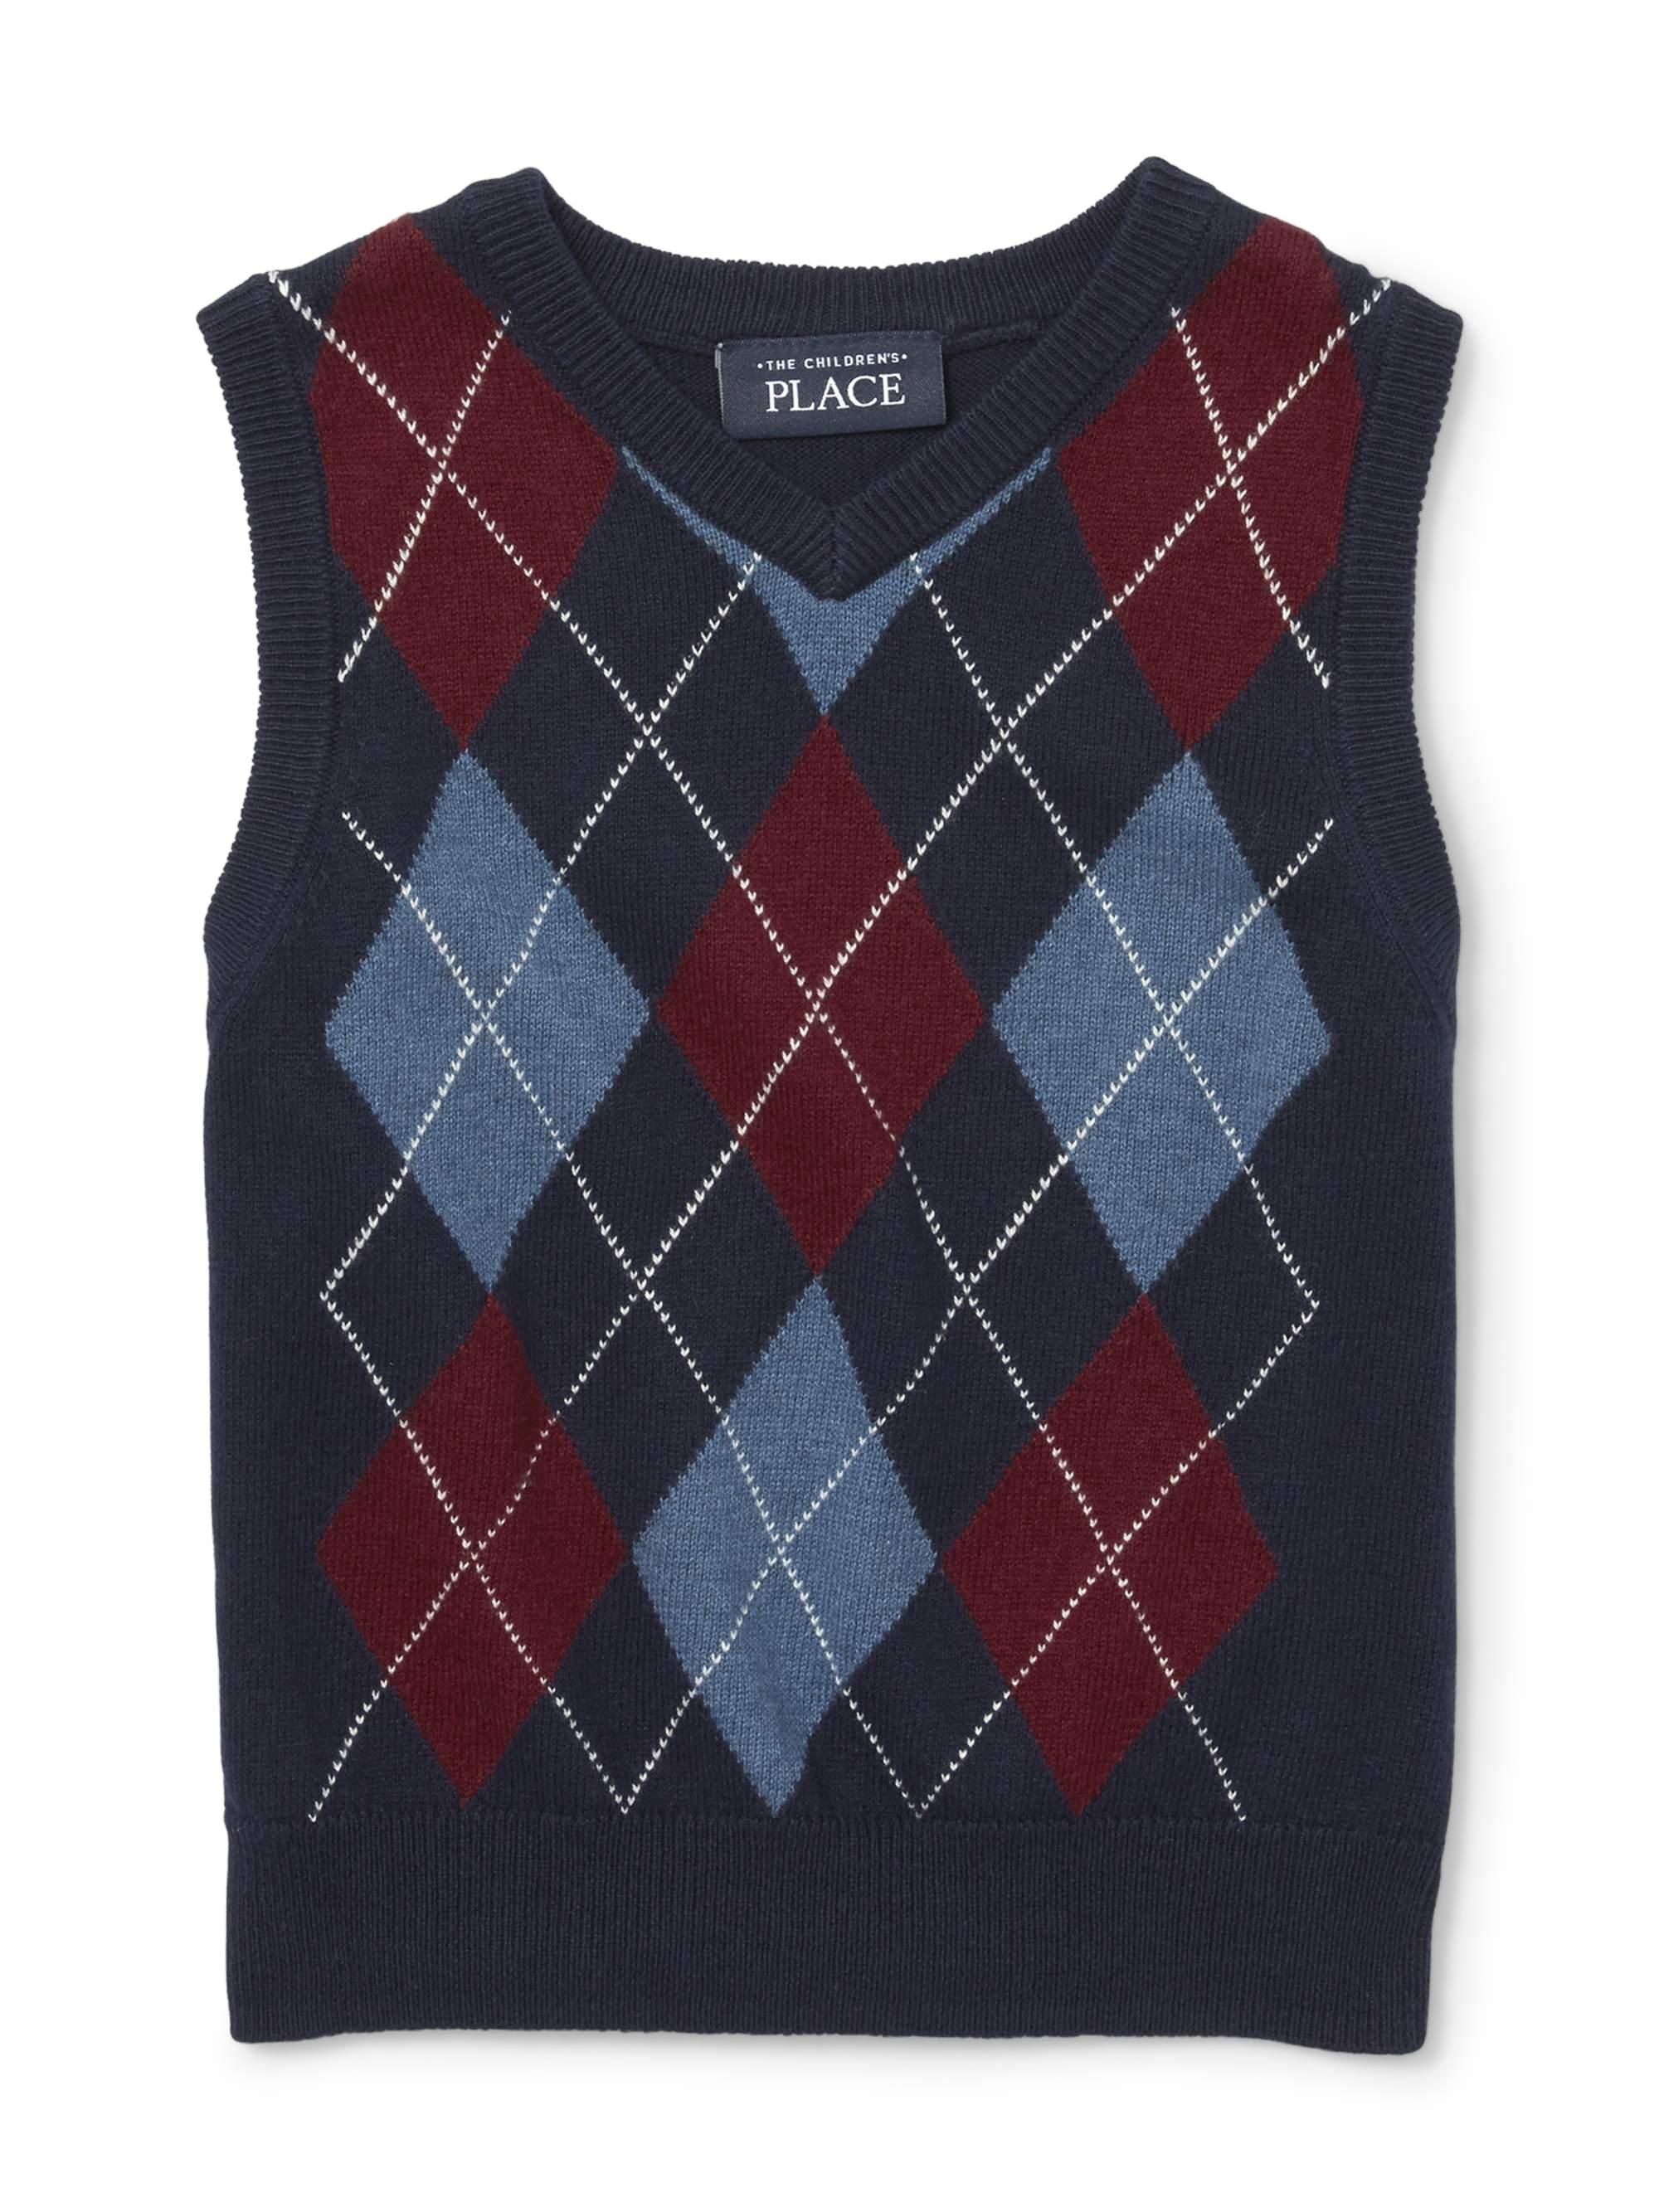 Toddler Boys Argyle Sweater Vest